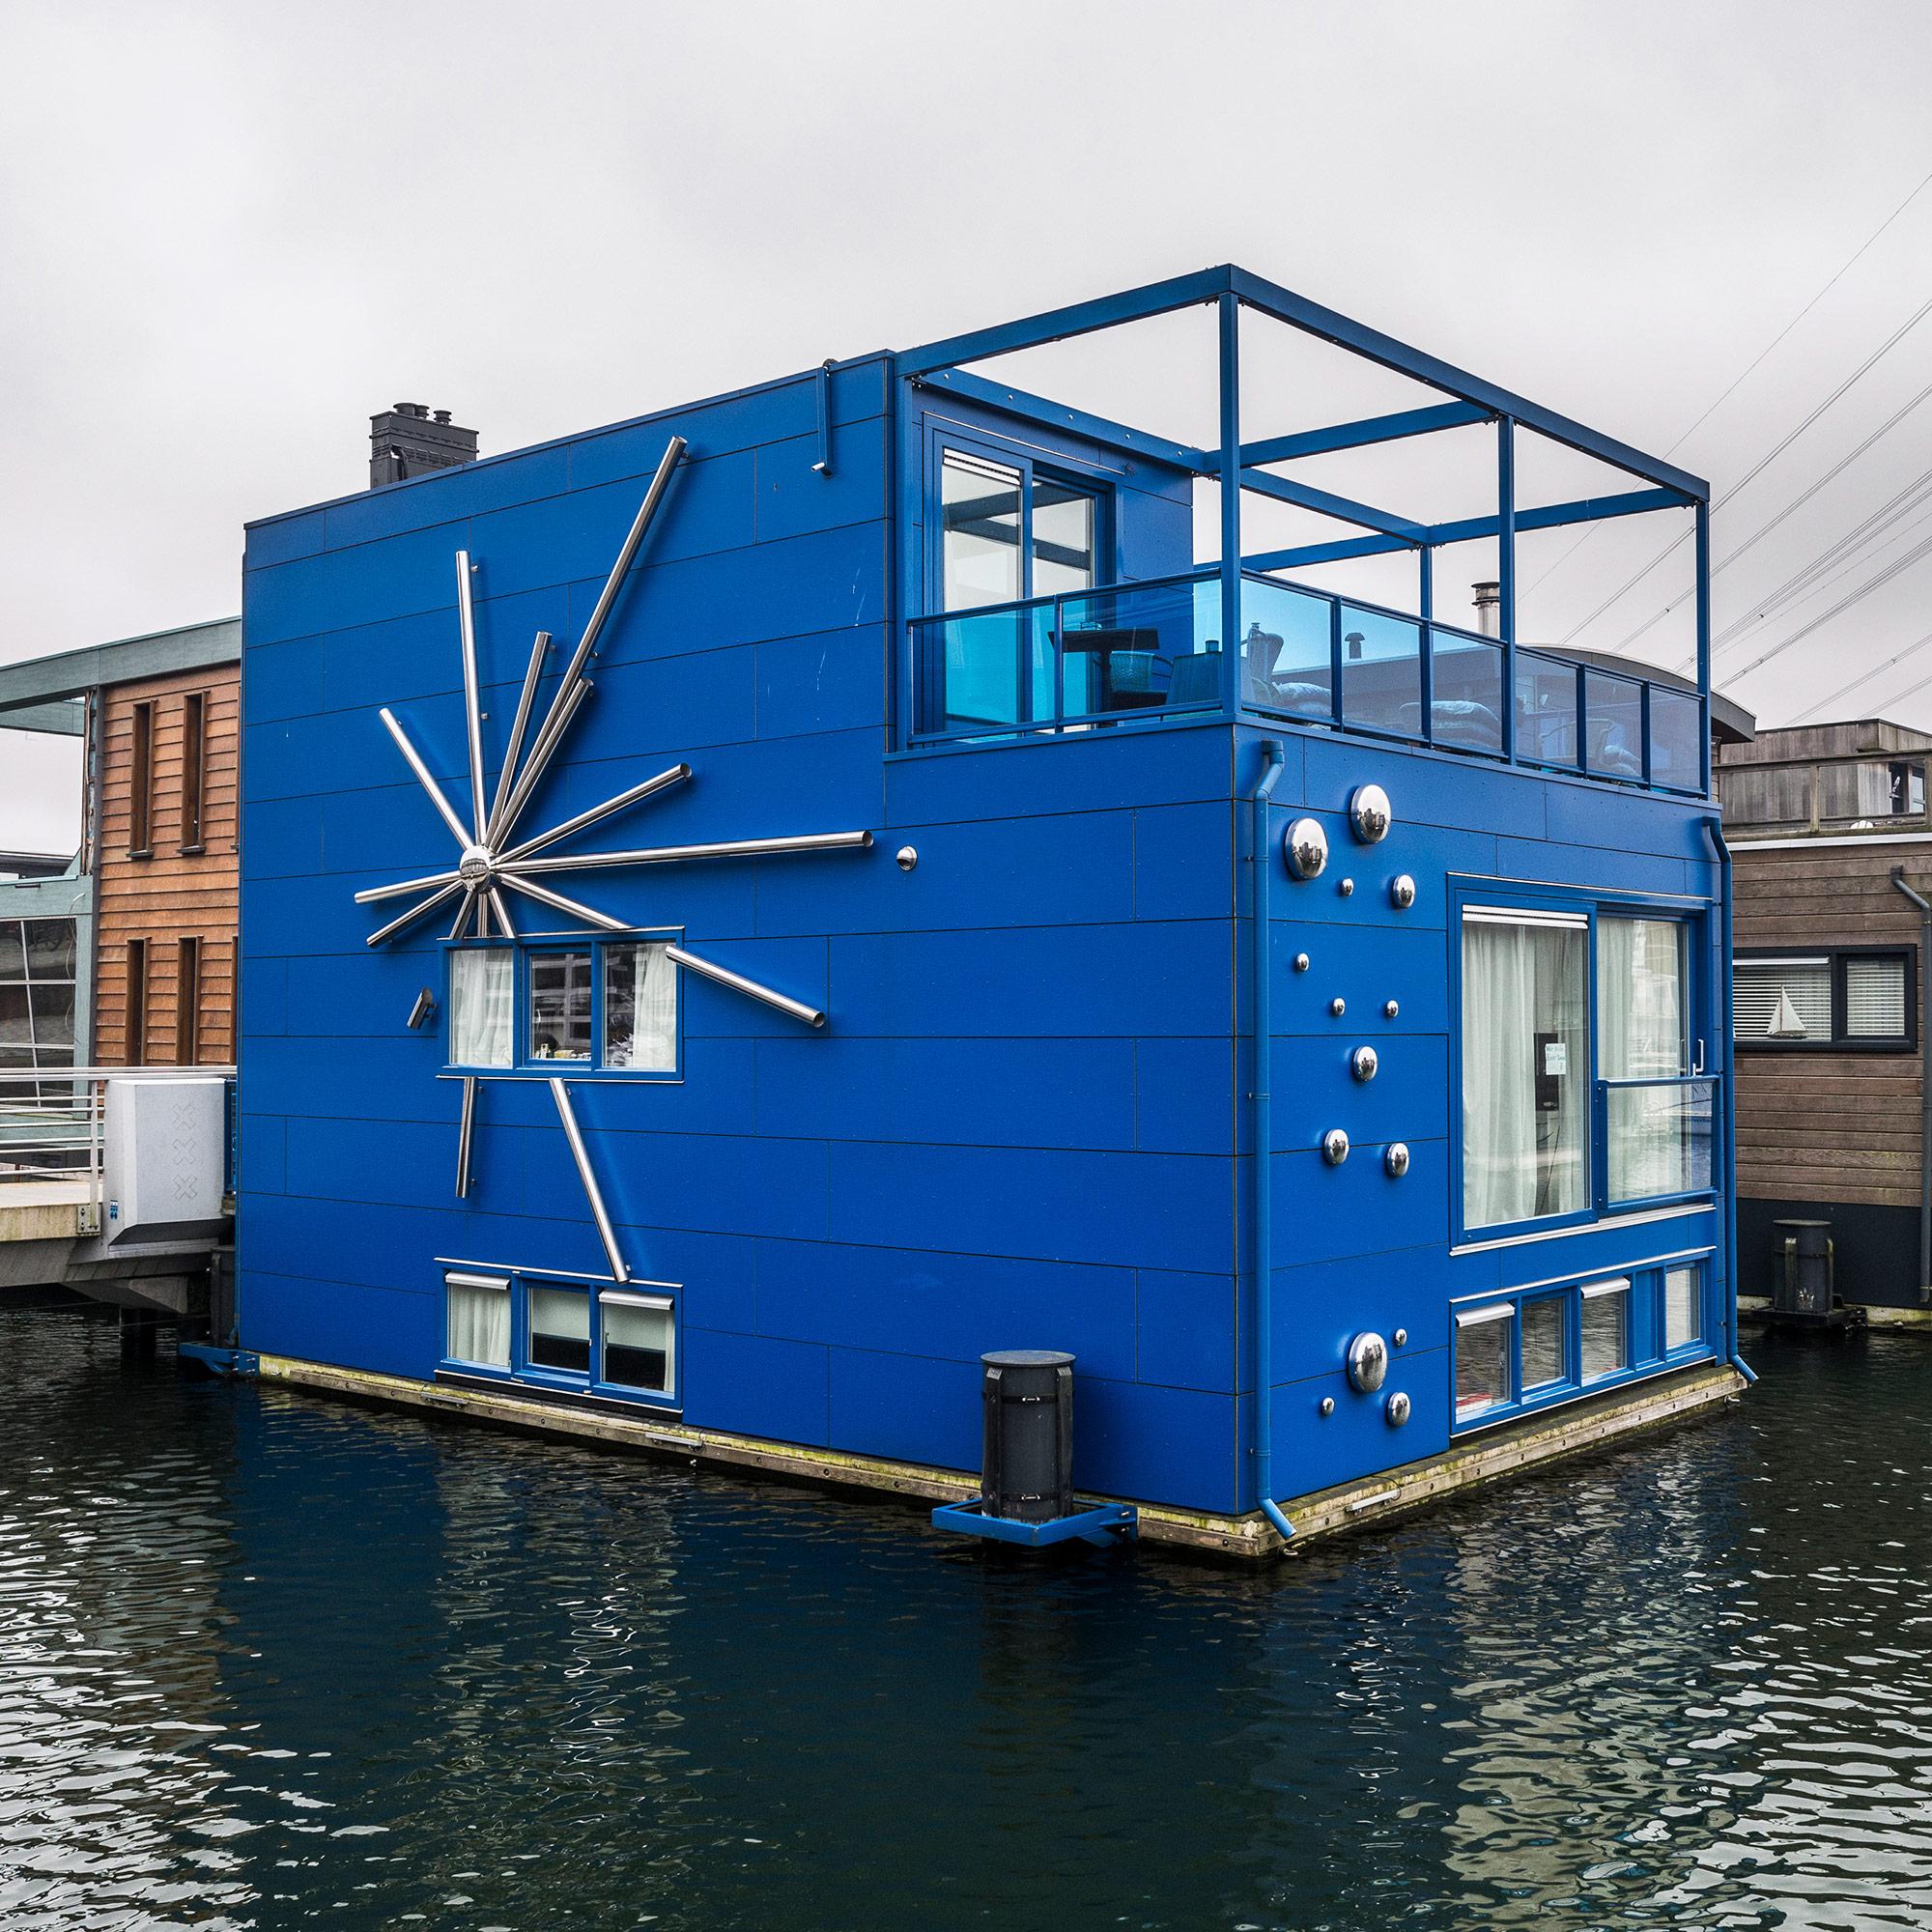 IJburg, a neighborhood of floating houses on the eastern edge of Amsterdam. (Photo by Joris van Gennip/GroundTruth)